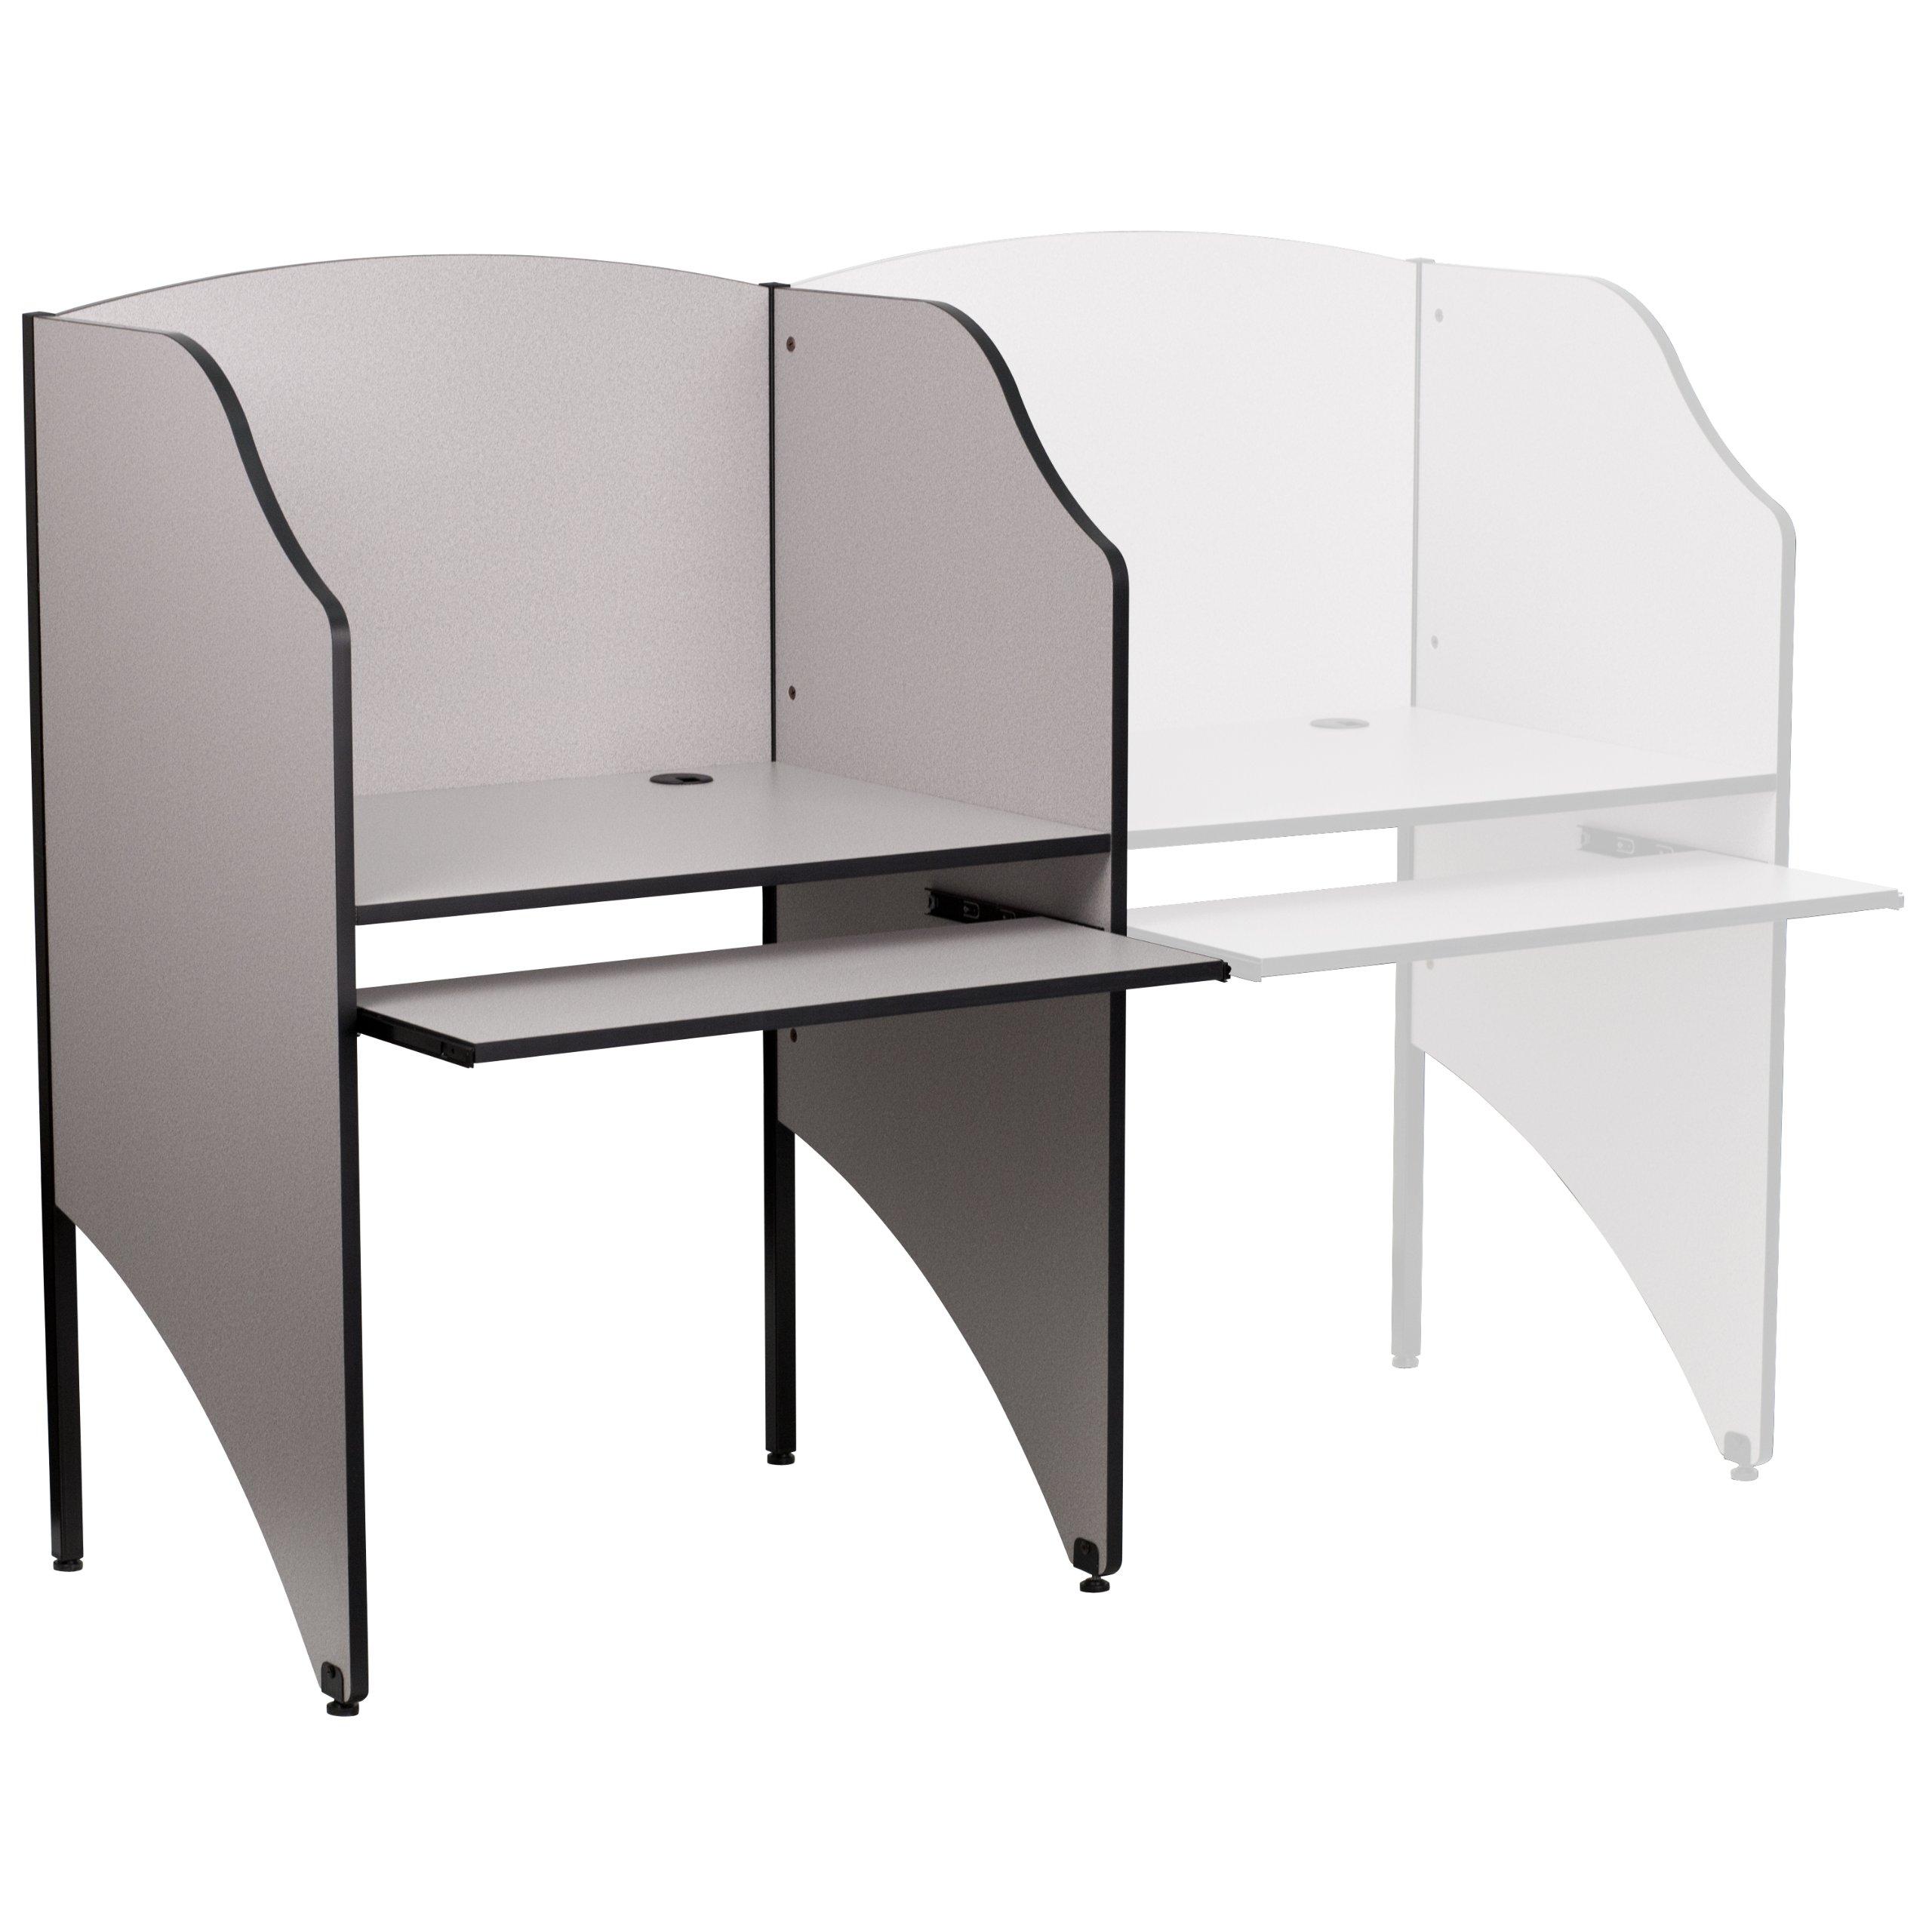 Flash Furniture Starter Study Carrel in Nebula Grey Finish by Flash Furniture